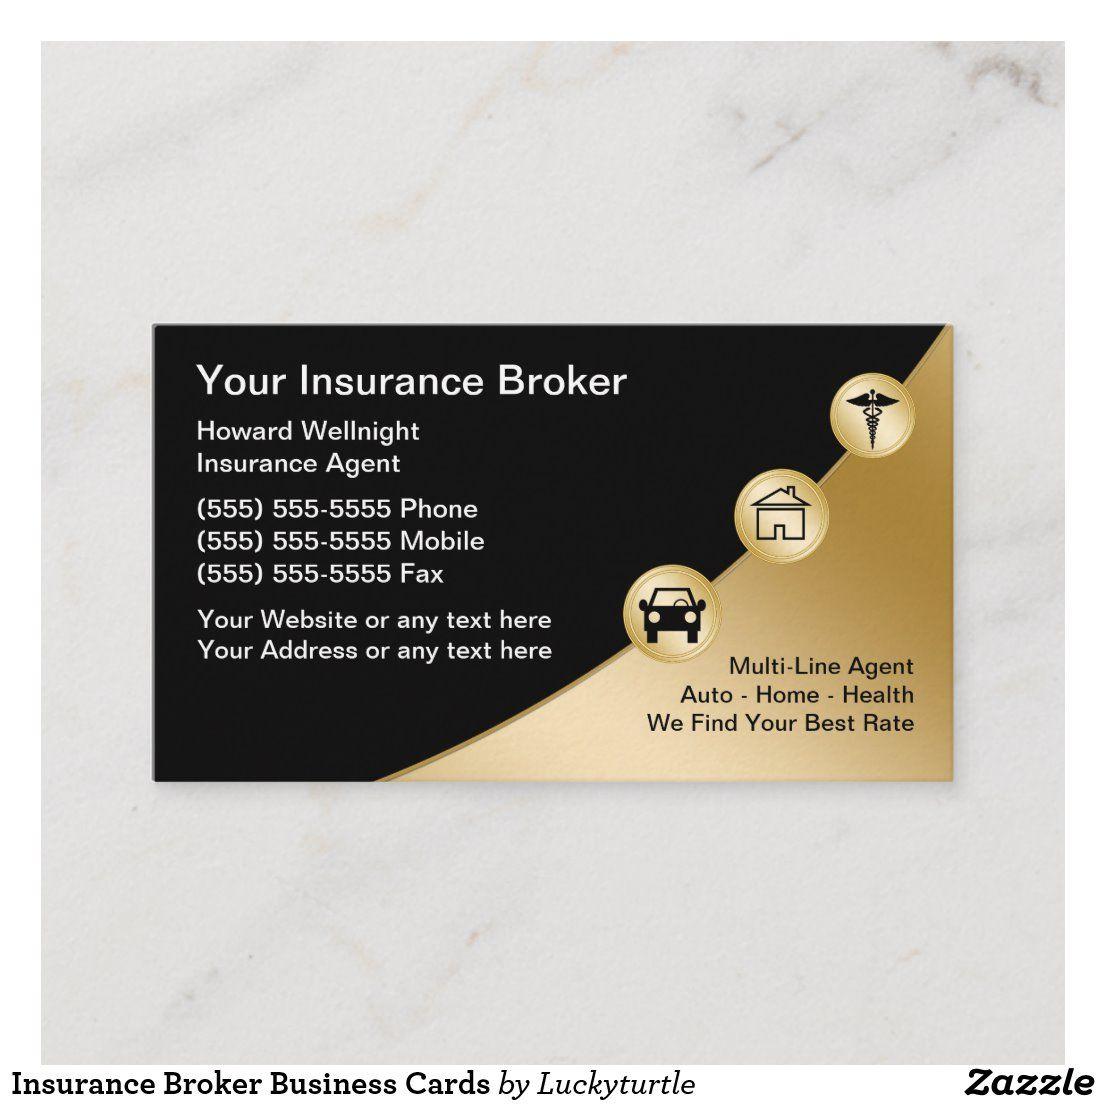 Insurance Broker Business Cards Zazzle Com Insurance Broker Brokers Business Insurance